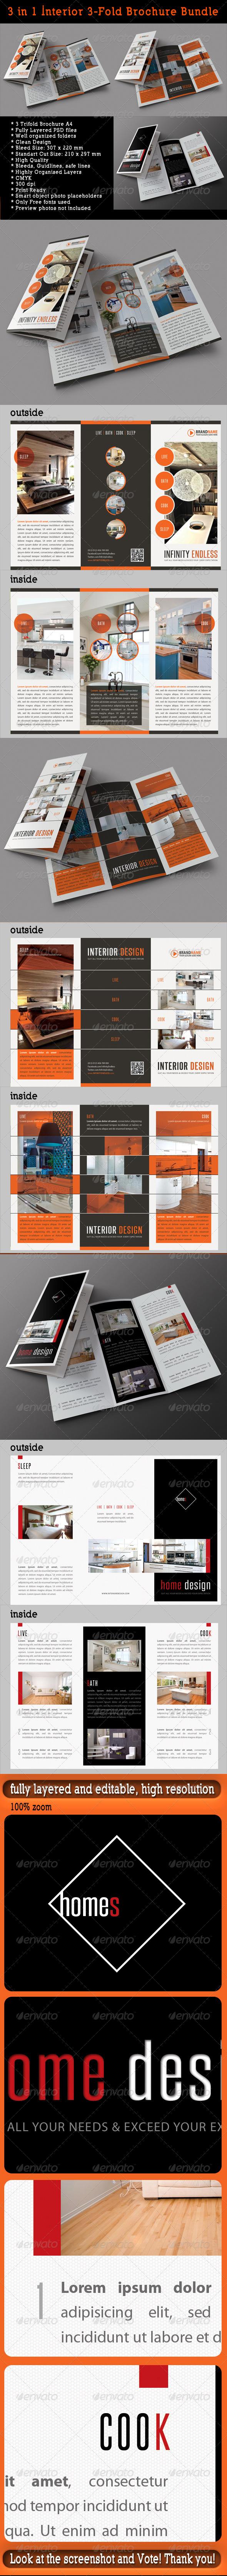 GraphicRiver 3 in 1 Interior 3-Fold Brochure Bundle 03 7930196